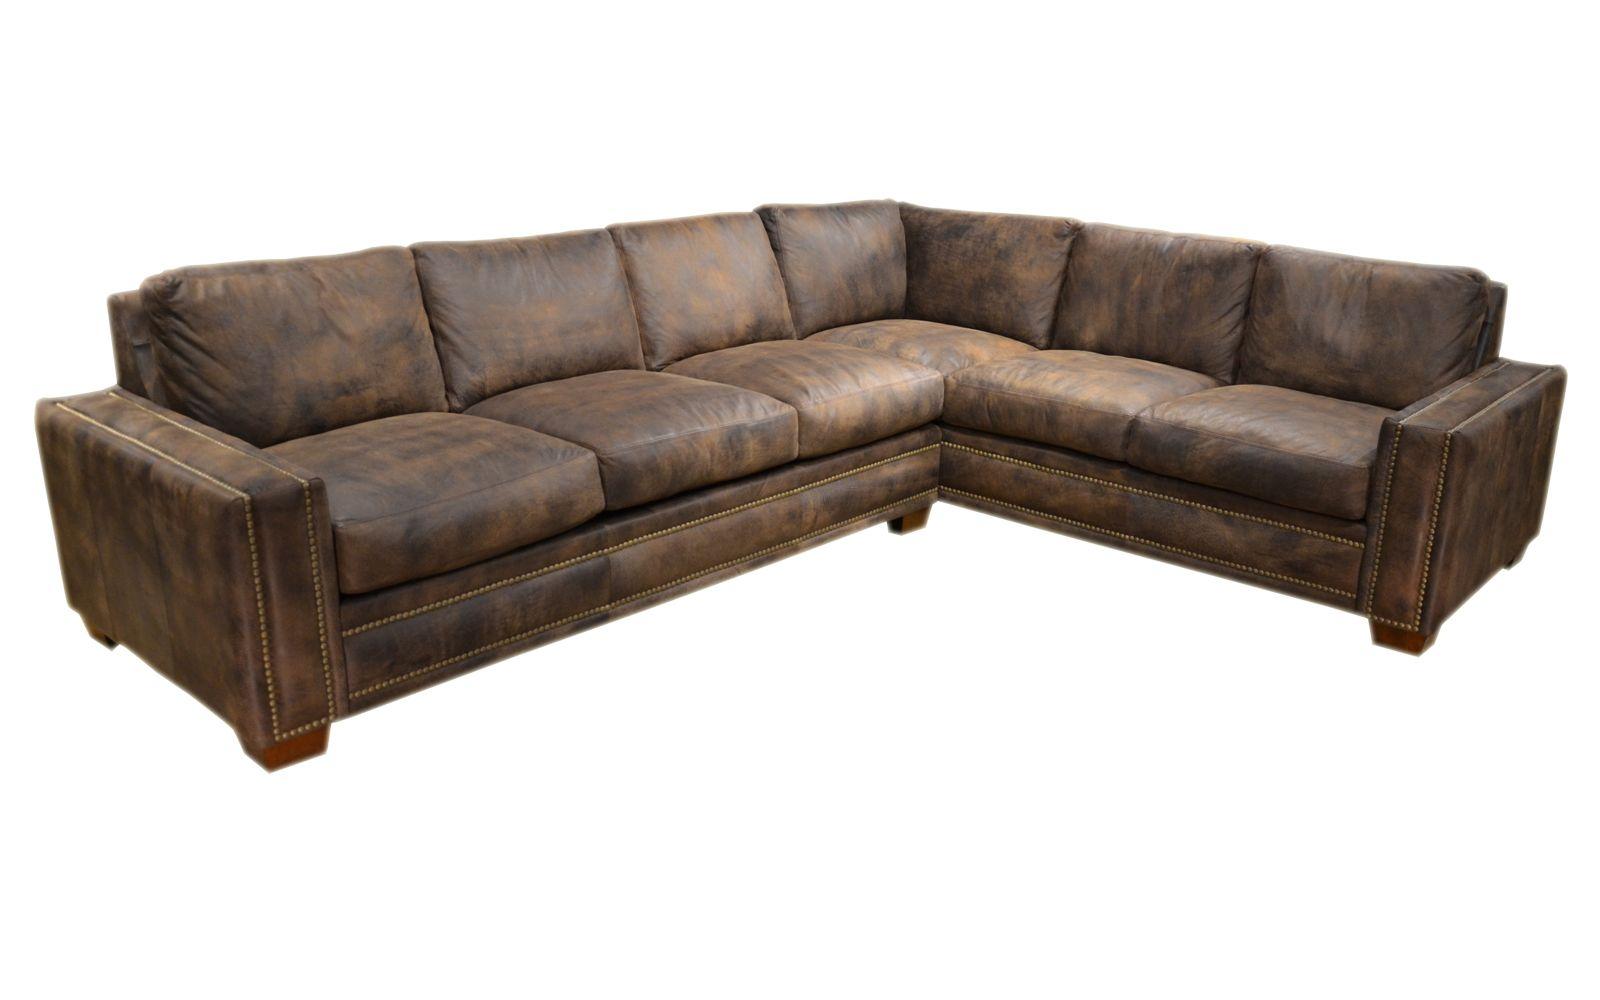 Best Leather Furniture In Texas San Antonio Austin Houston Dallas Plano Leather Sectional Leather Furniture Leather Sectional Sofas